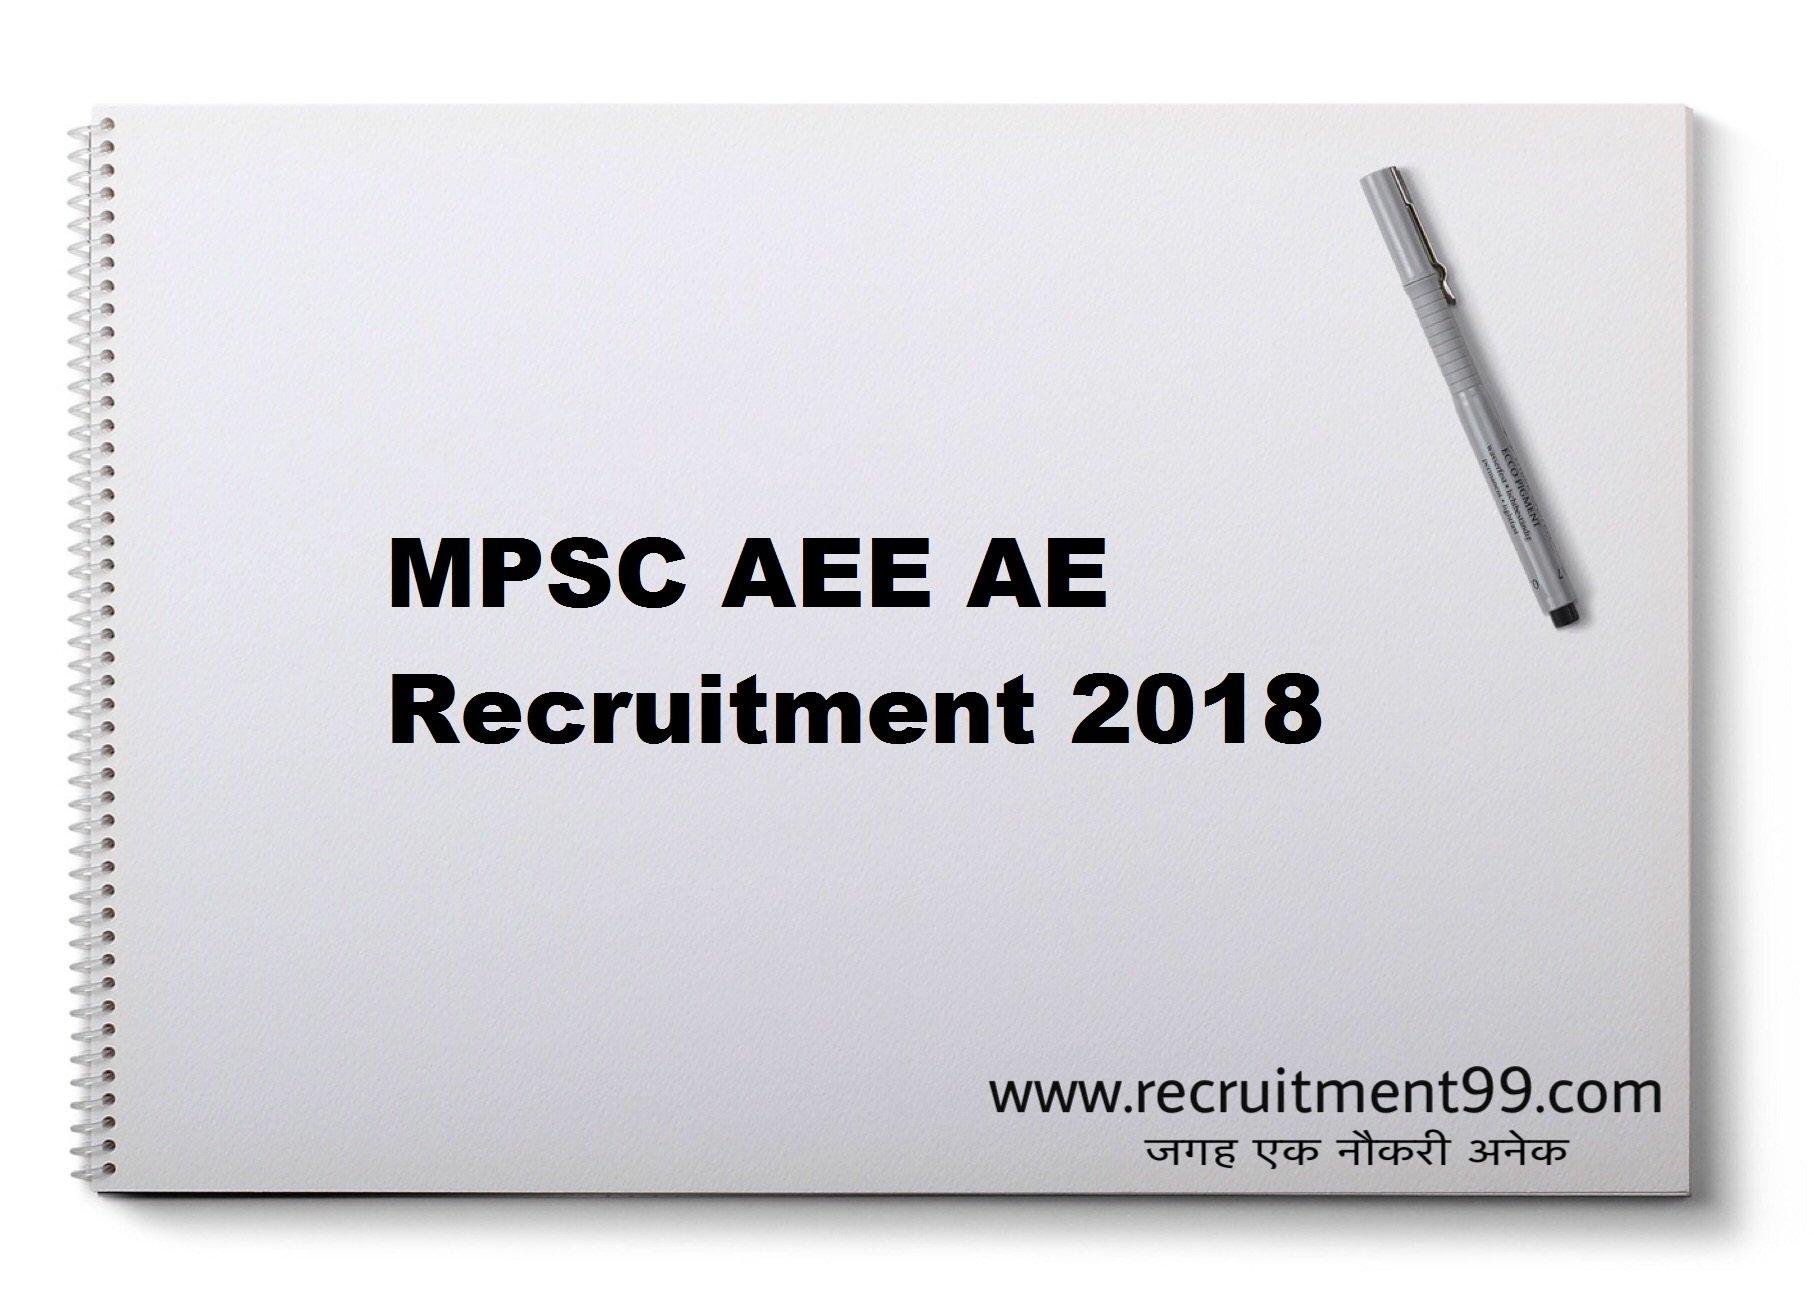 MPSC AEE AE Recruitment Admit Card Result 2018